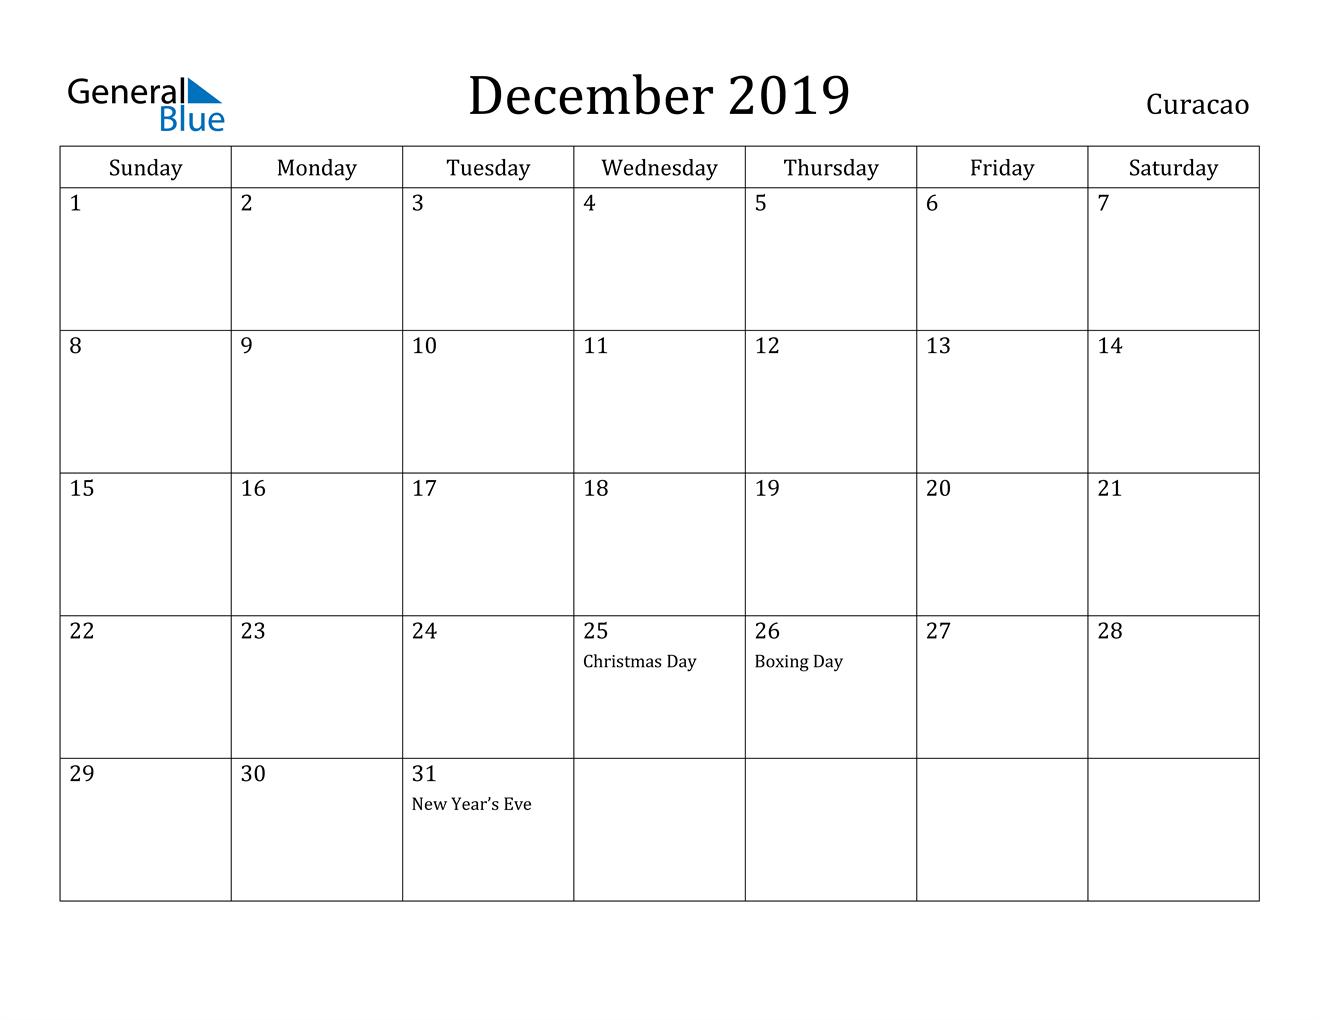 Image of December 2019 Curacao Calendar with Holidays Calendar